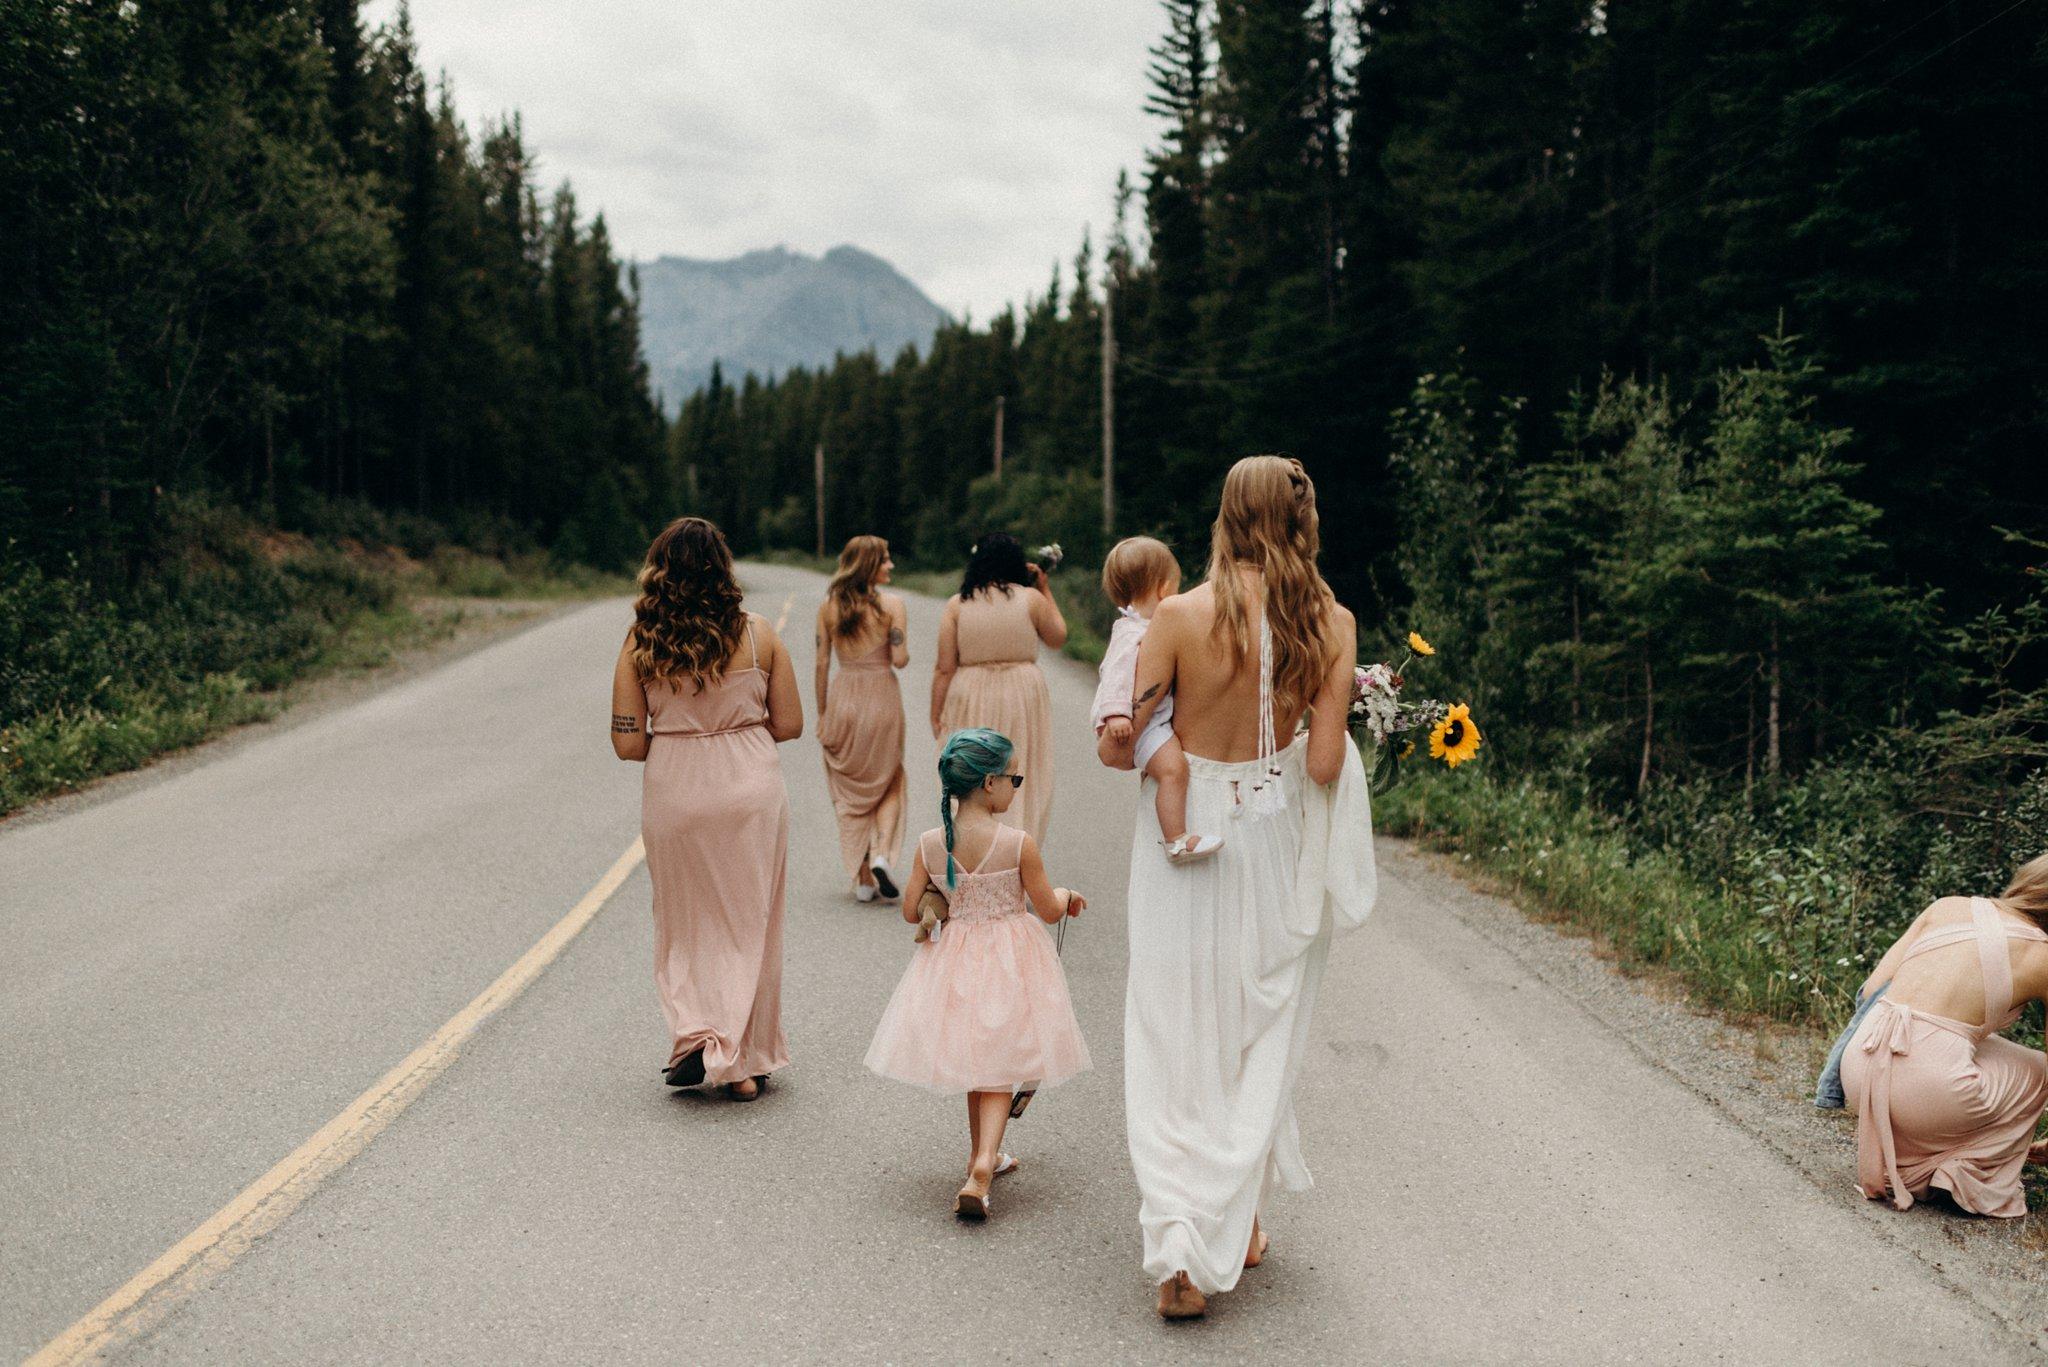 kaihla_tonai_intimate_wedding_elopement_photographer_6356.jpg